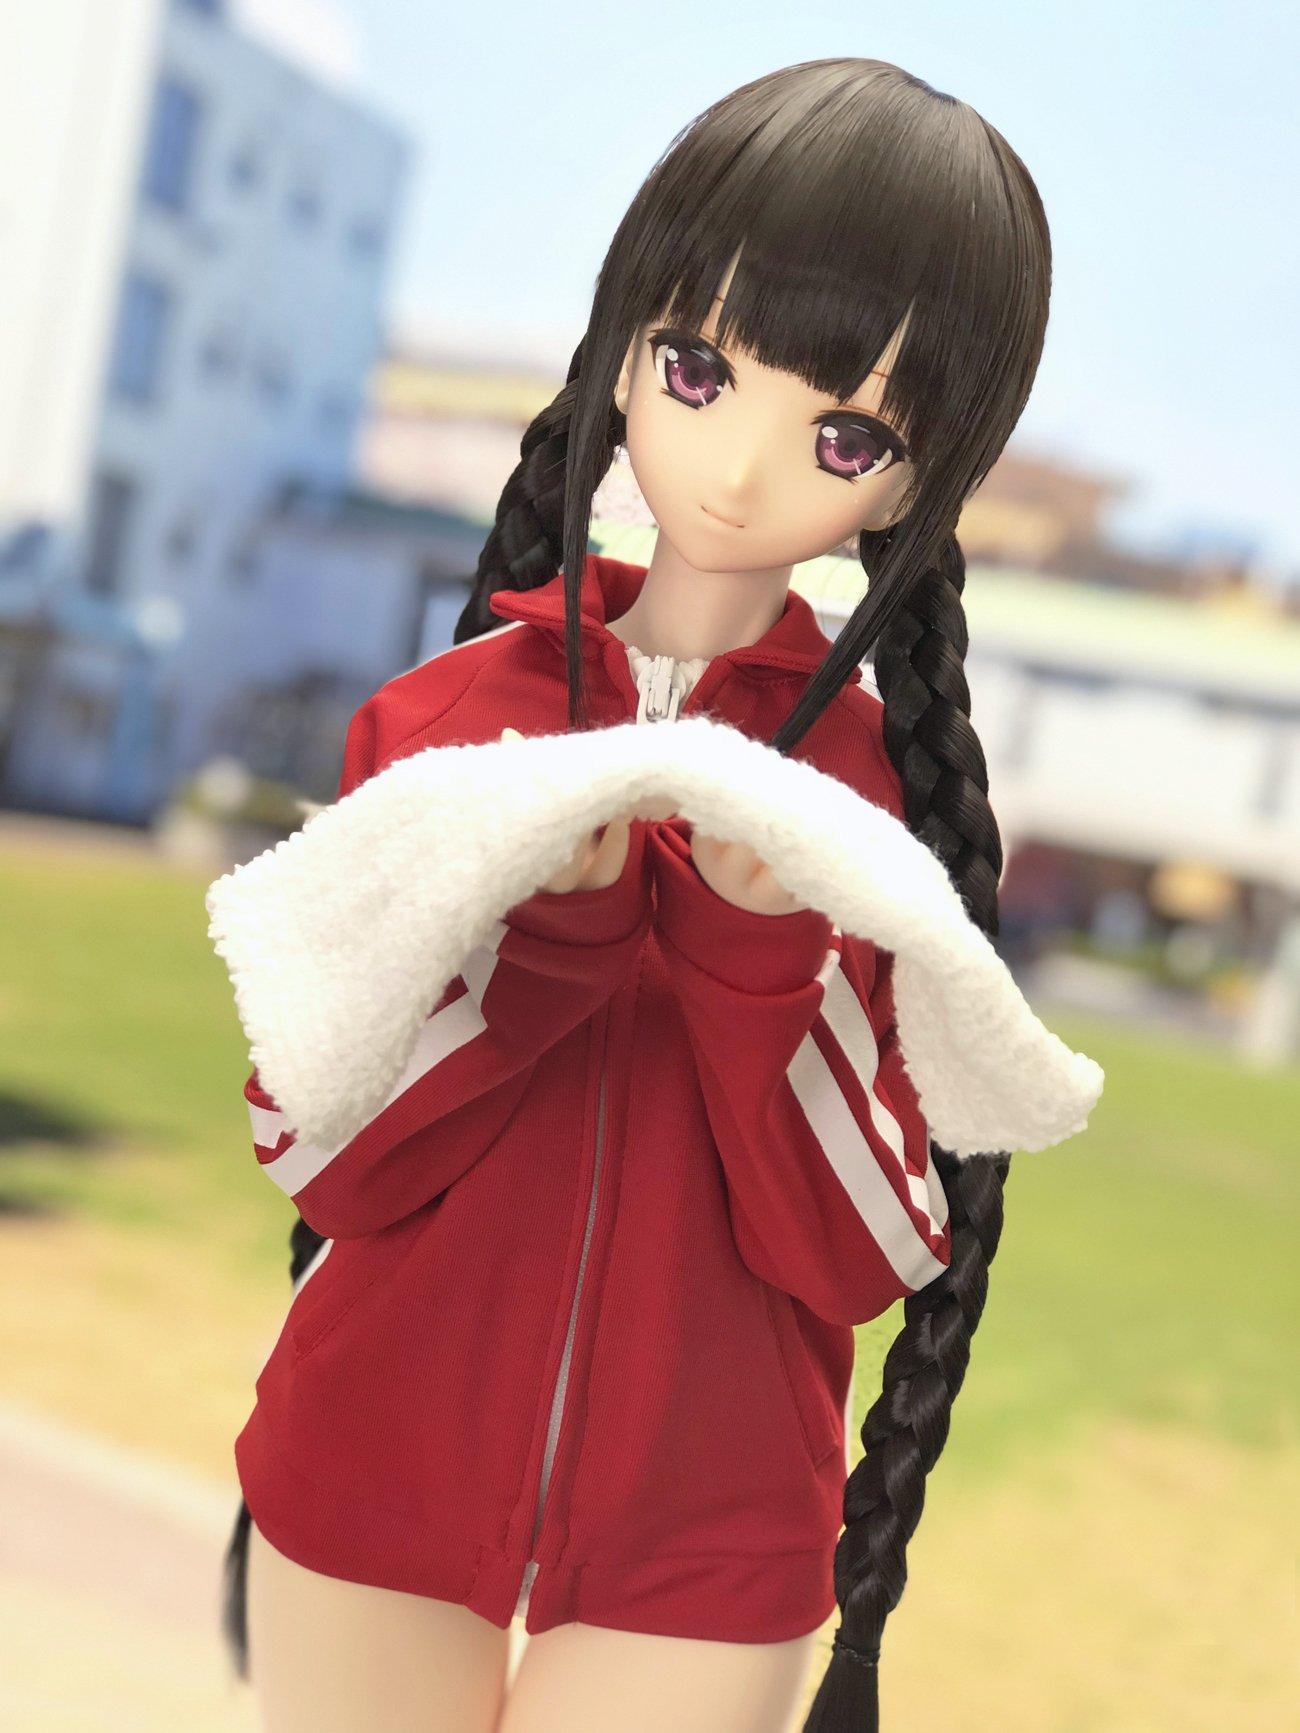 [Azone] 1/3 Happiness Clover - Yukari - Kazuharu Kina School Uniform Collection  Edxkgf10